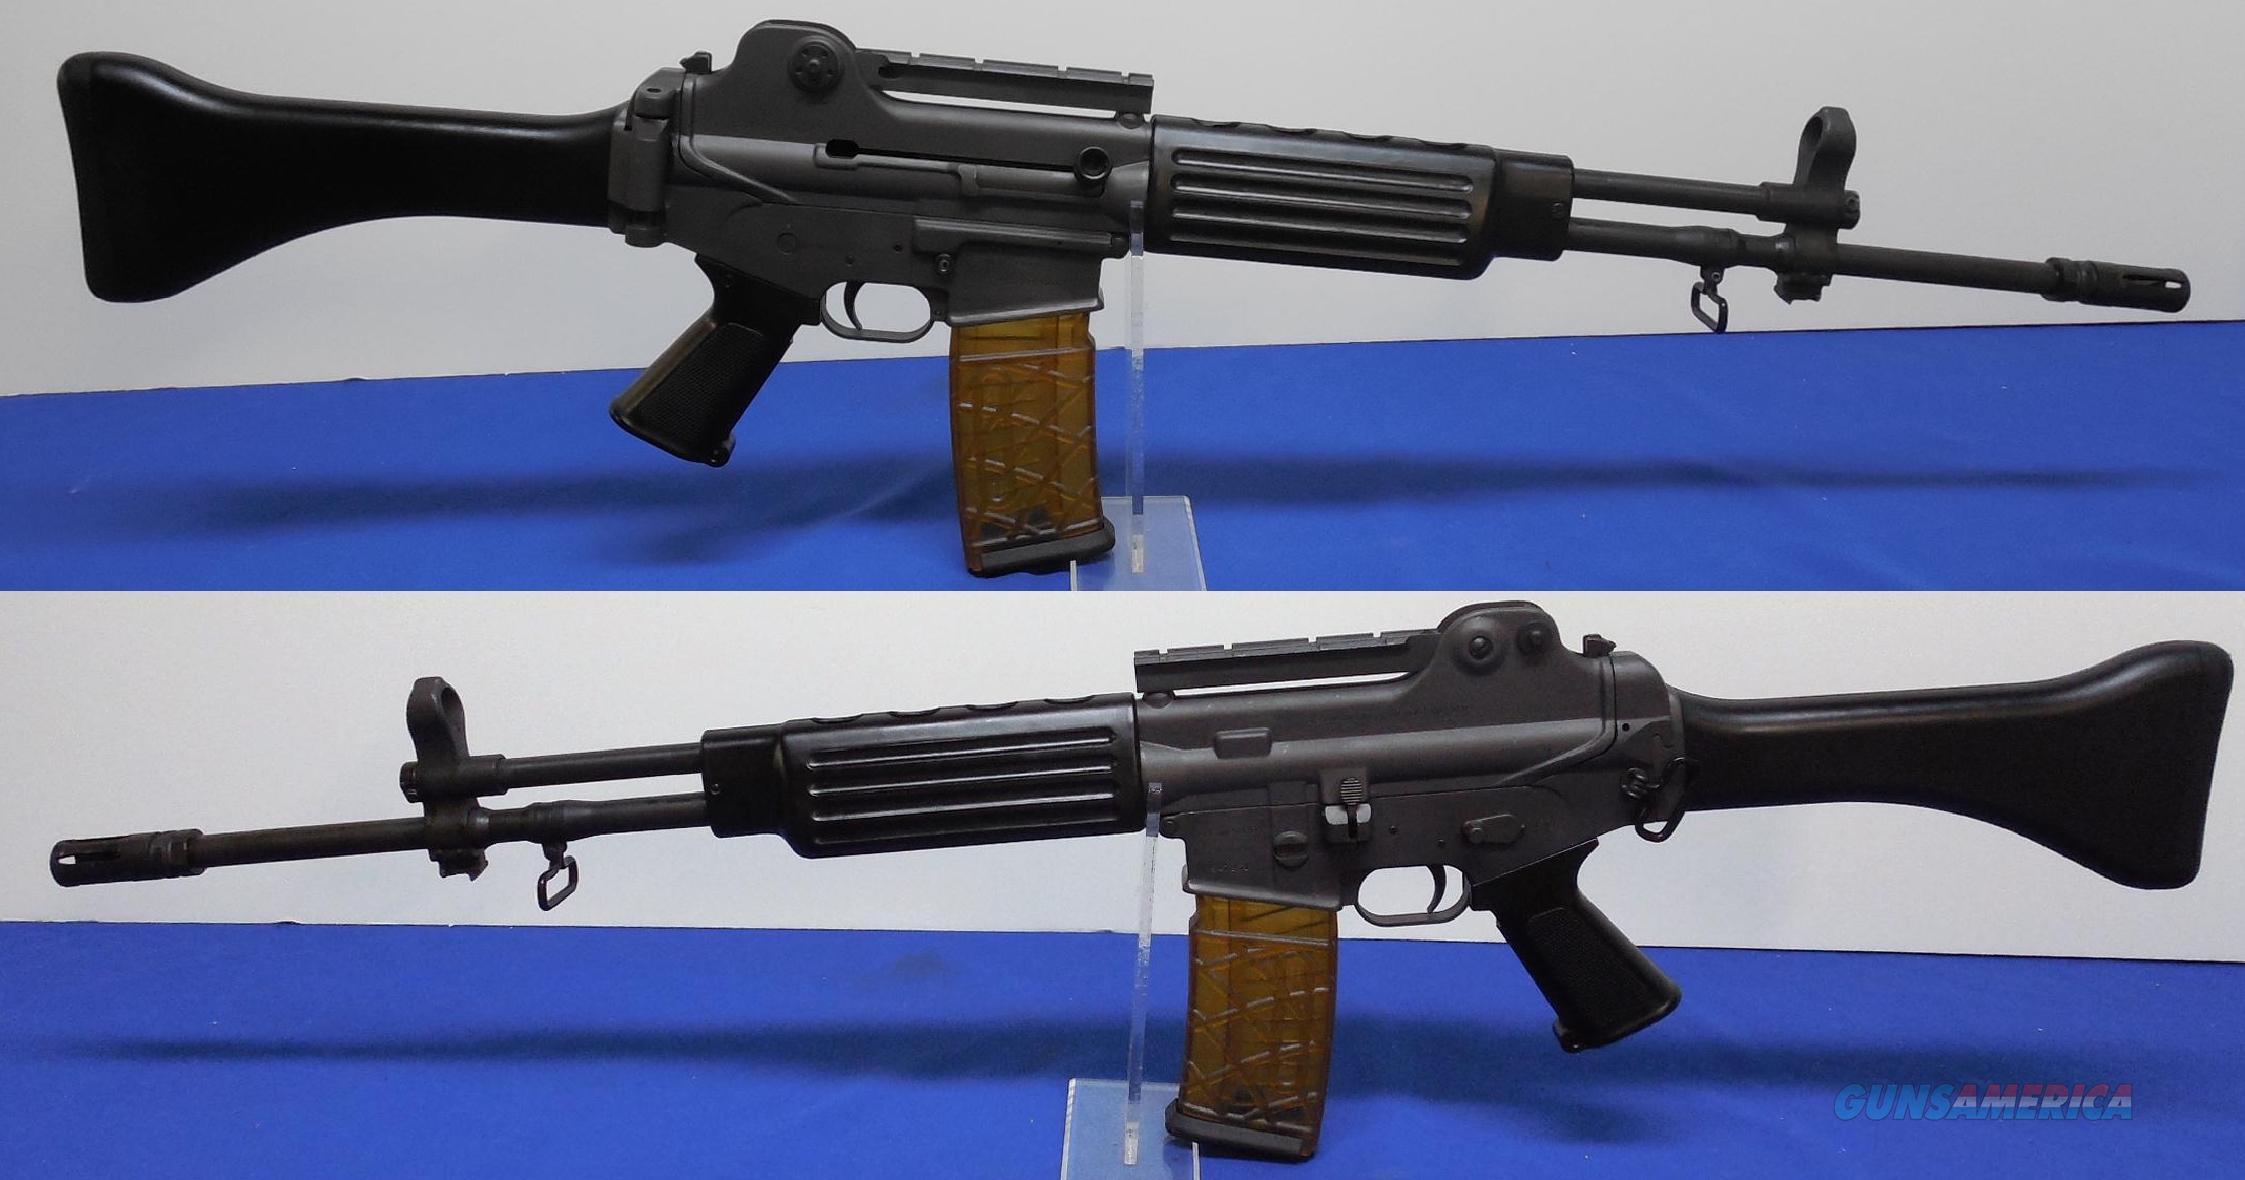 Daewoo AR-100 Semi-Auto Rifle, (Pre Ban) for sale